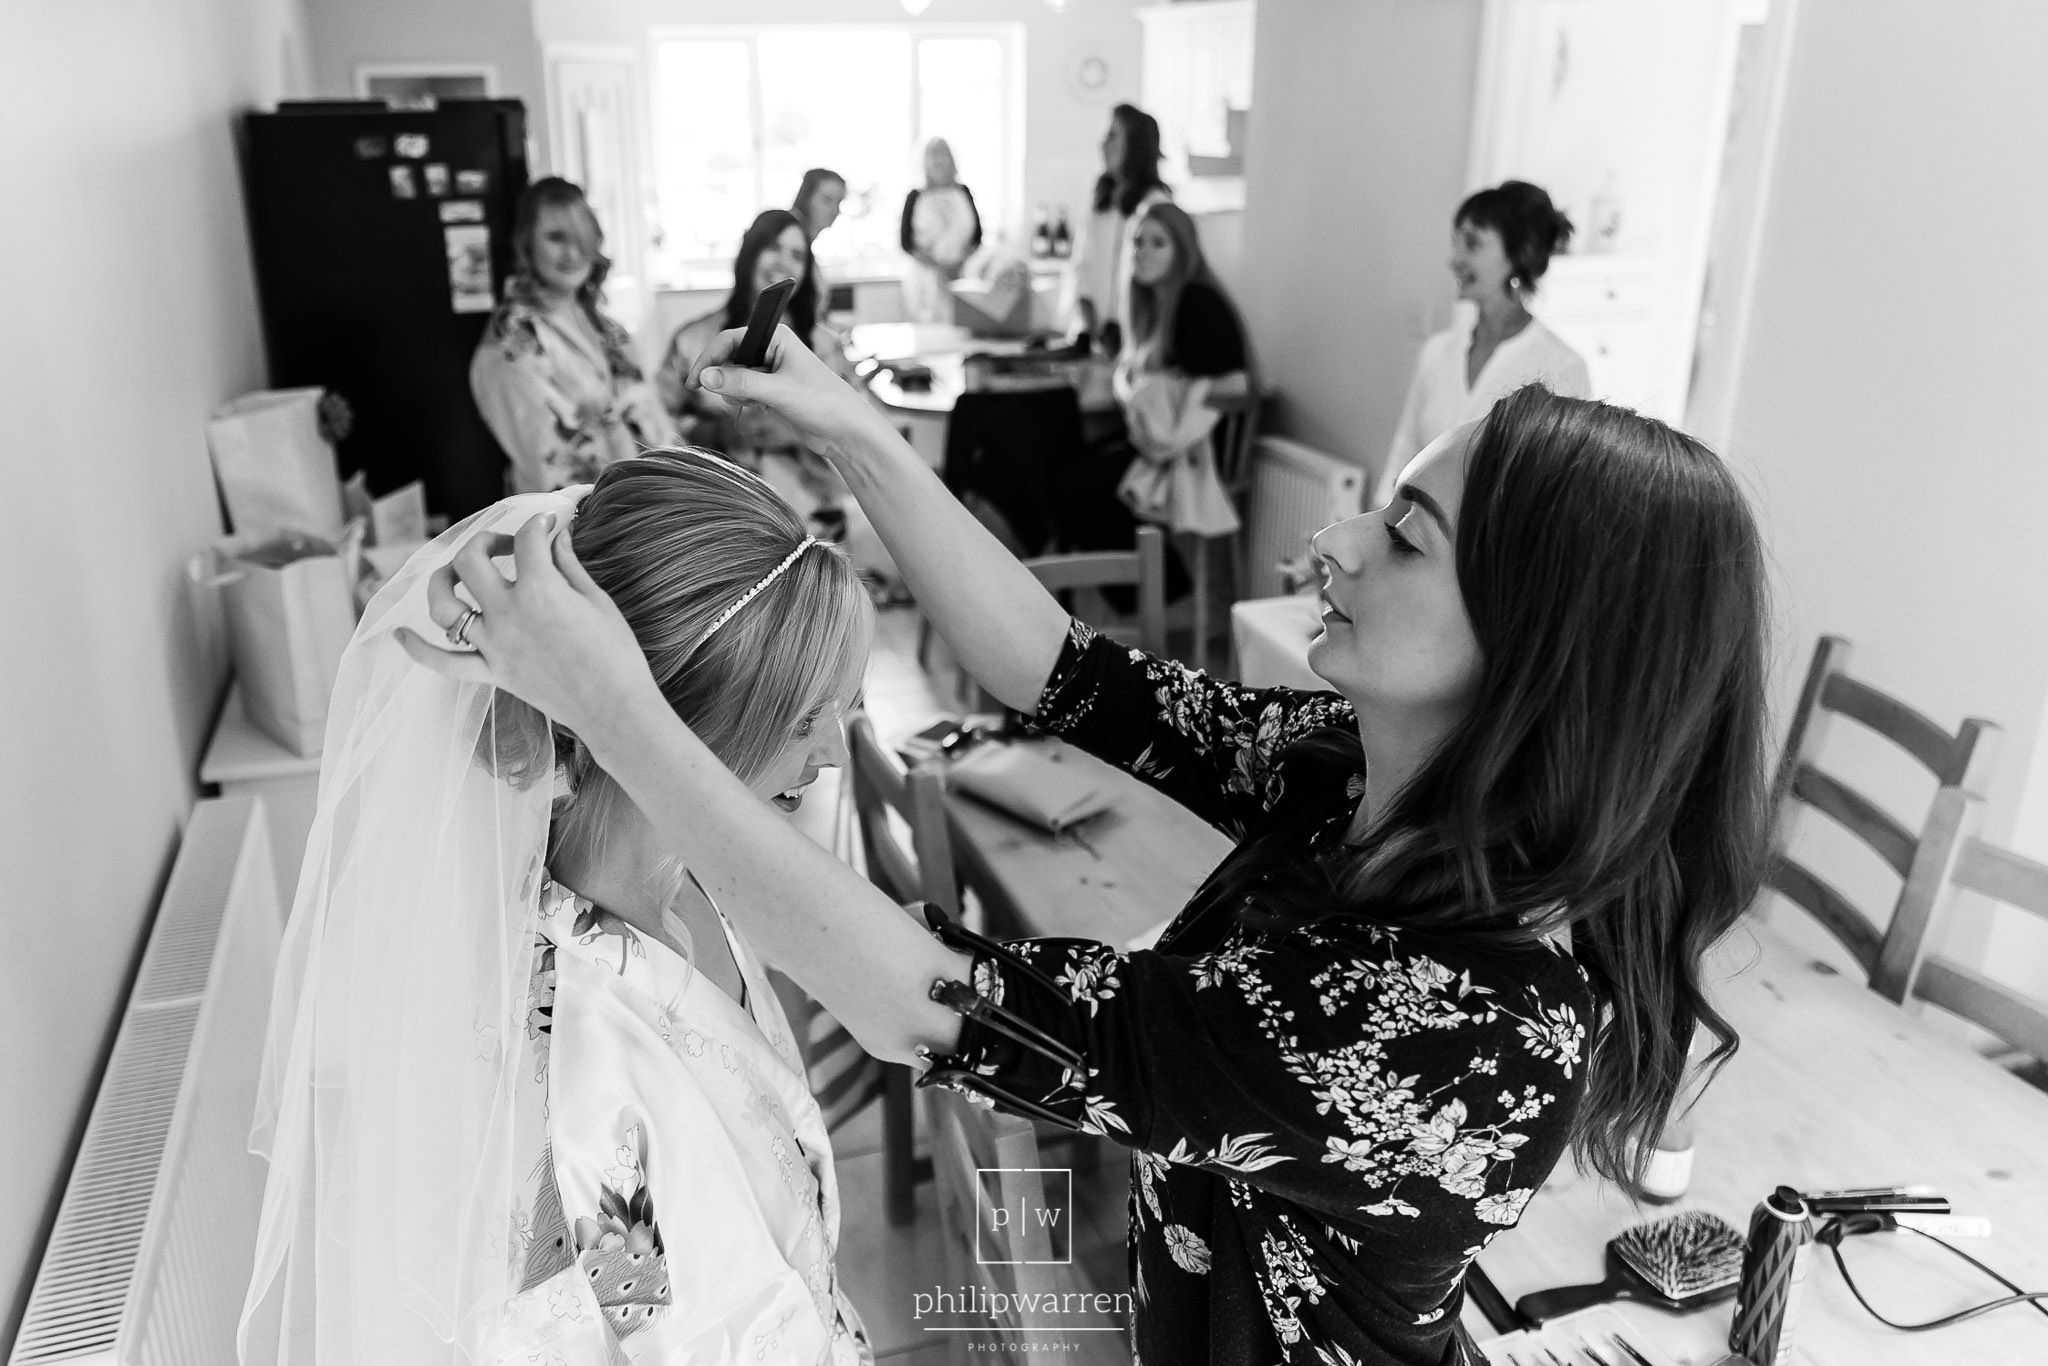 hairdresser putting in veil for bride before wedding